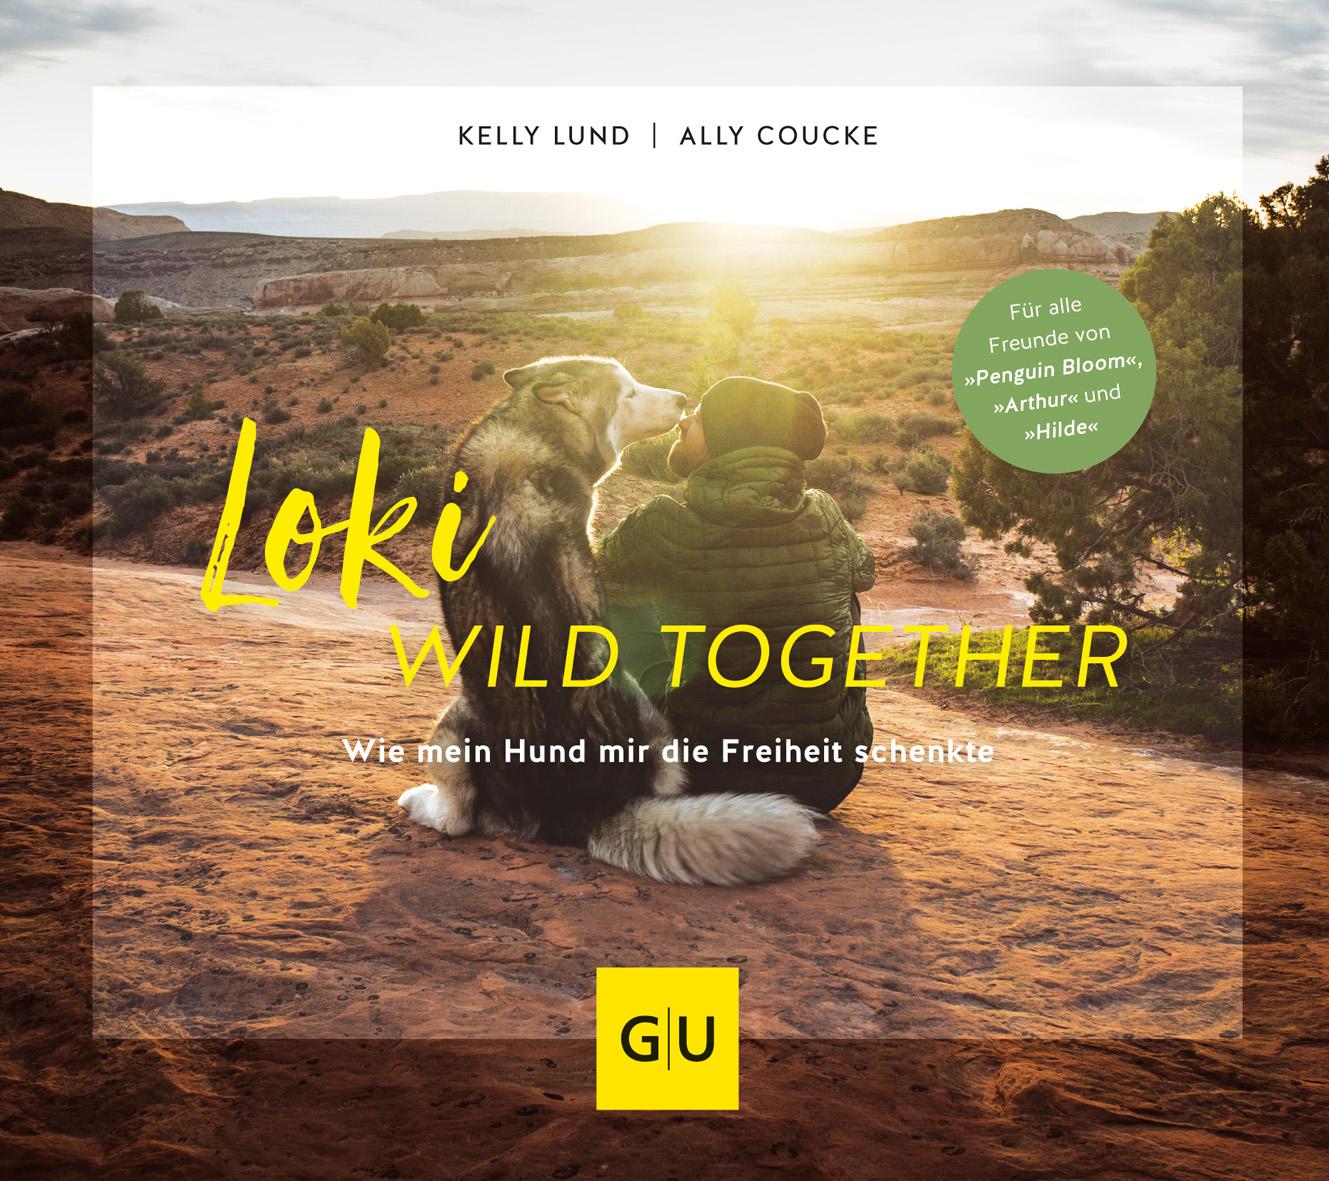 Loki - wild together [Ally Coucke]